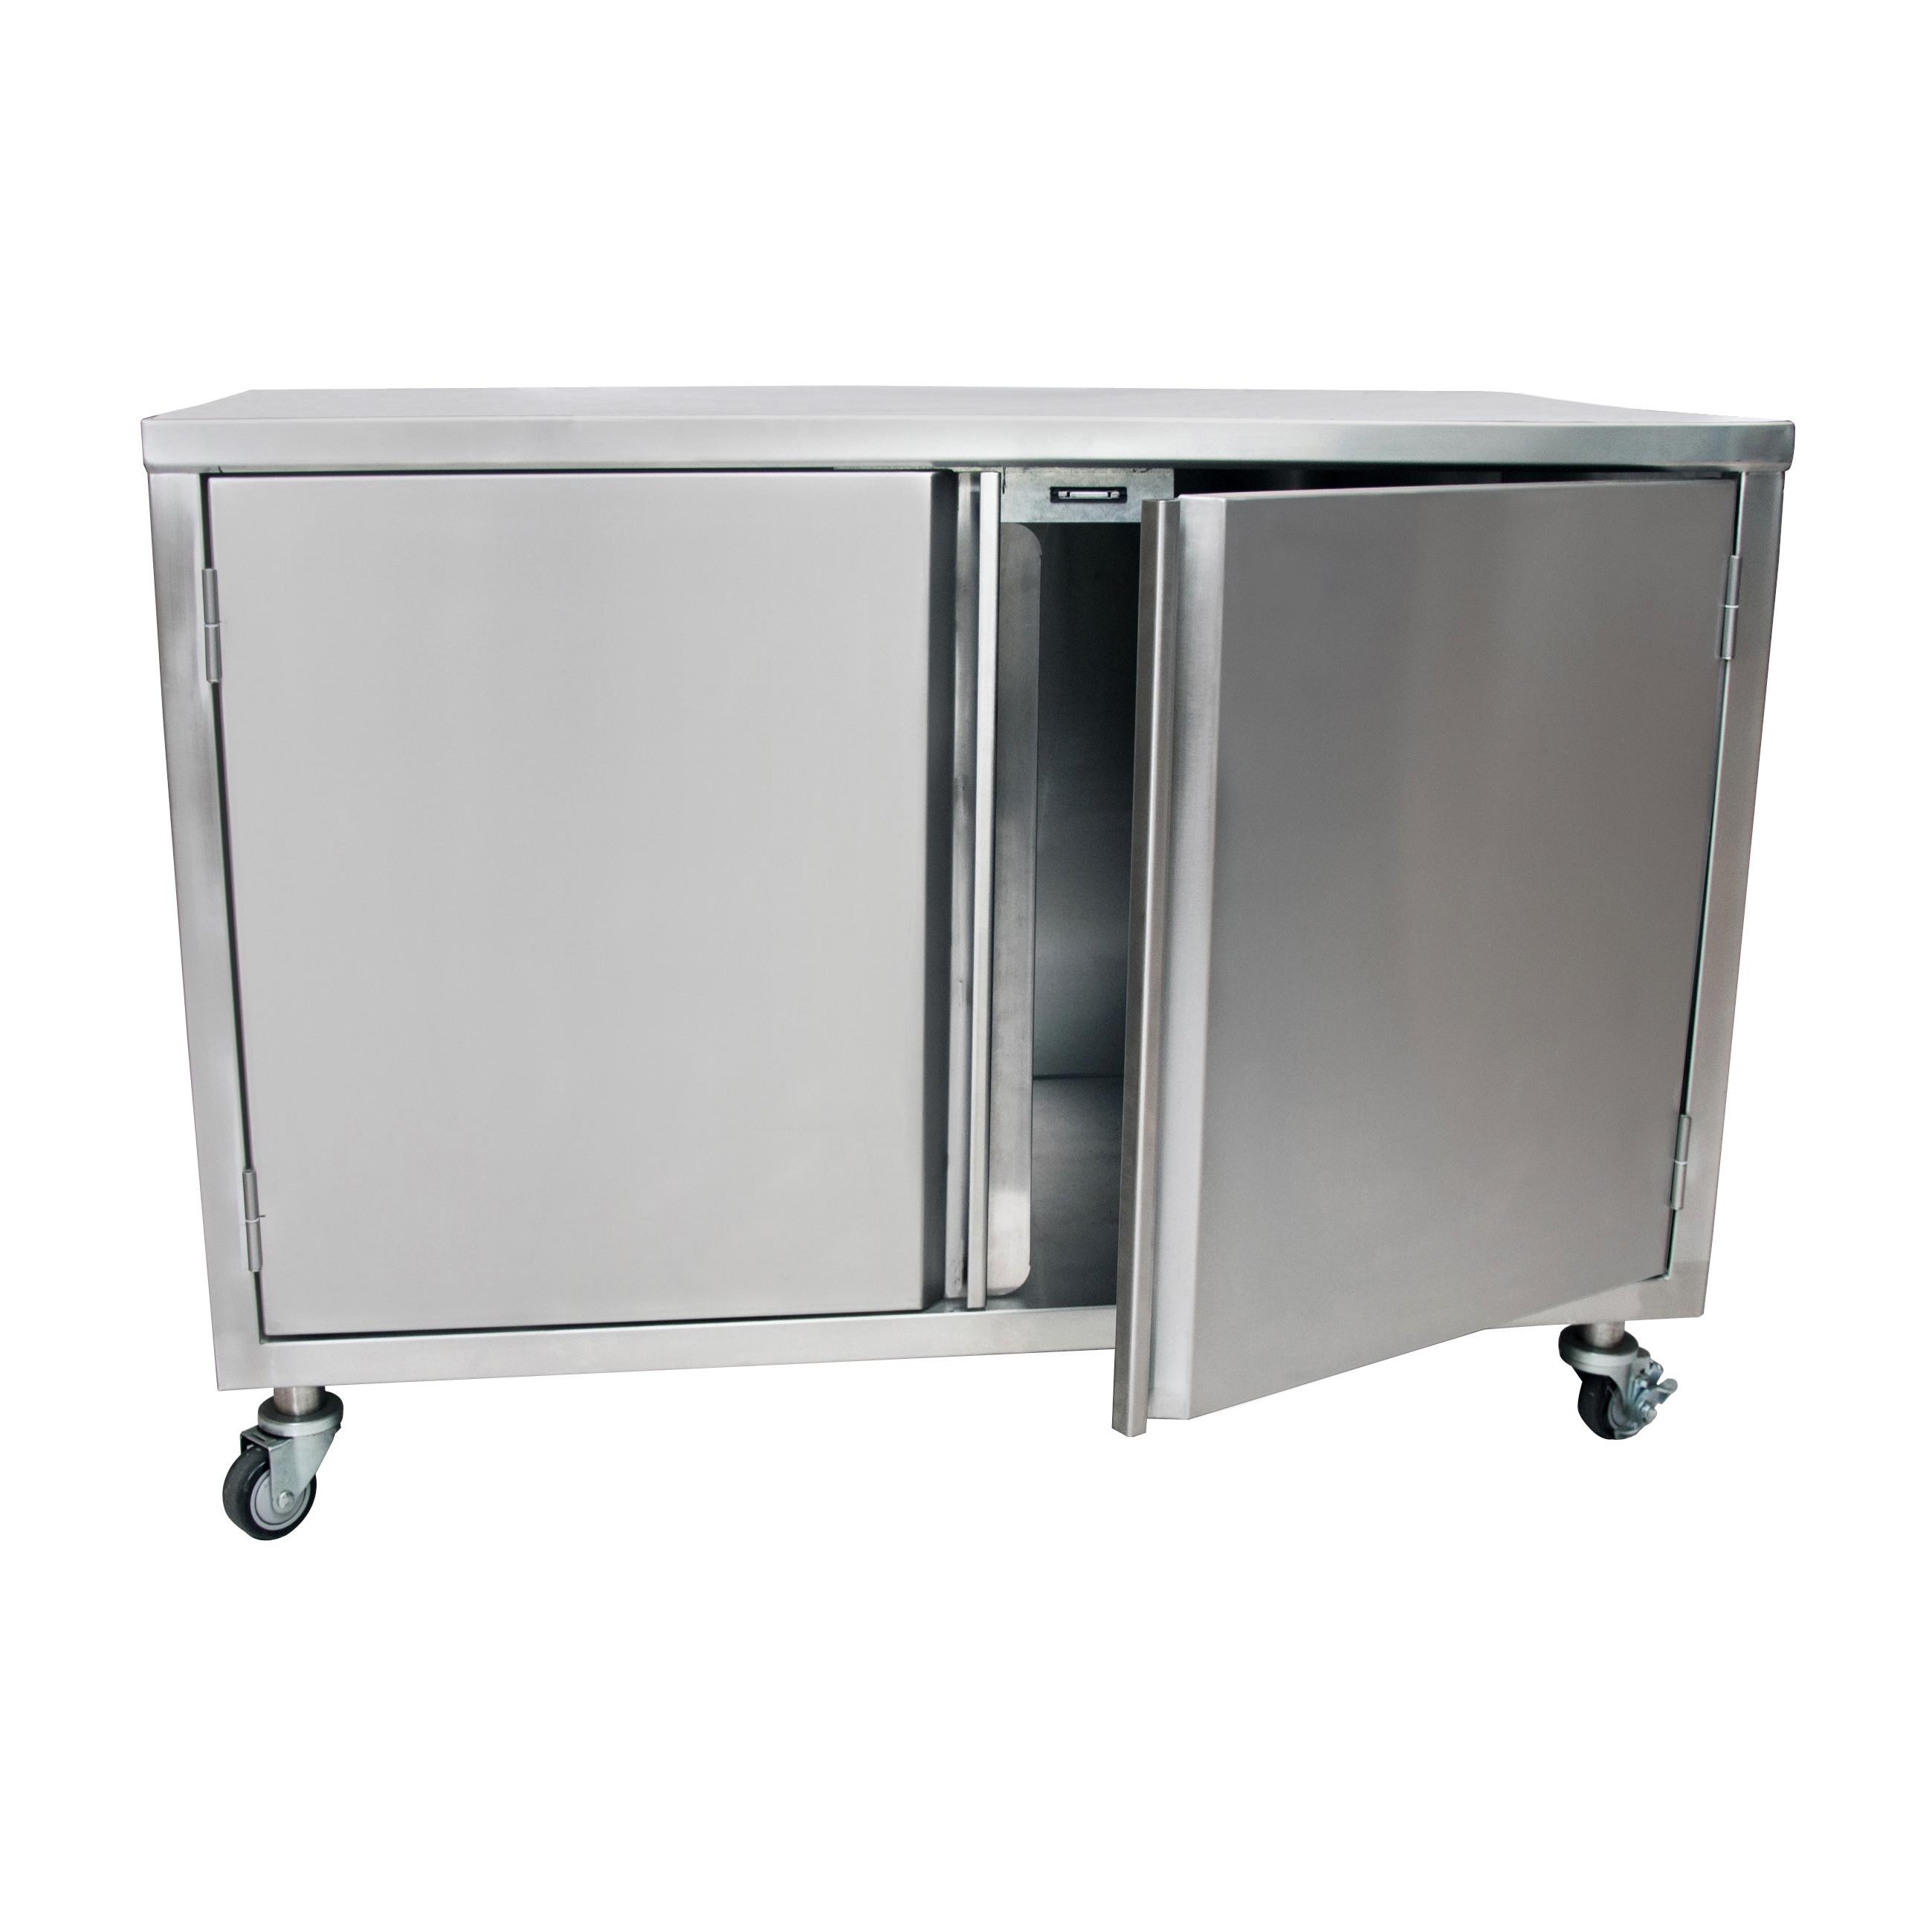 BK Resources BKDC-3018H work table, cabinet base hinged doors